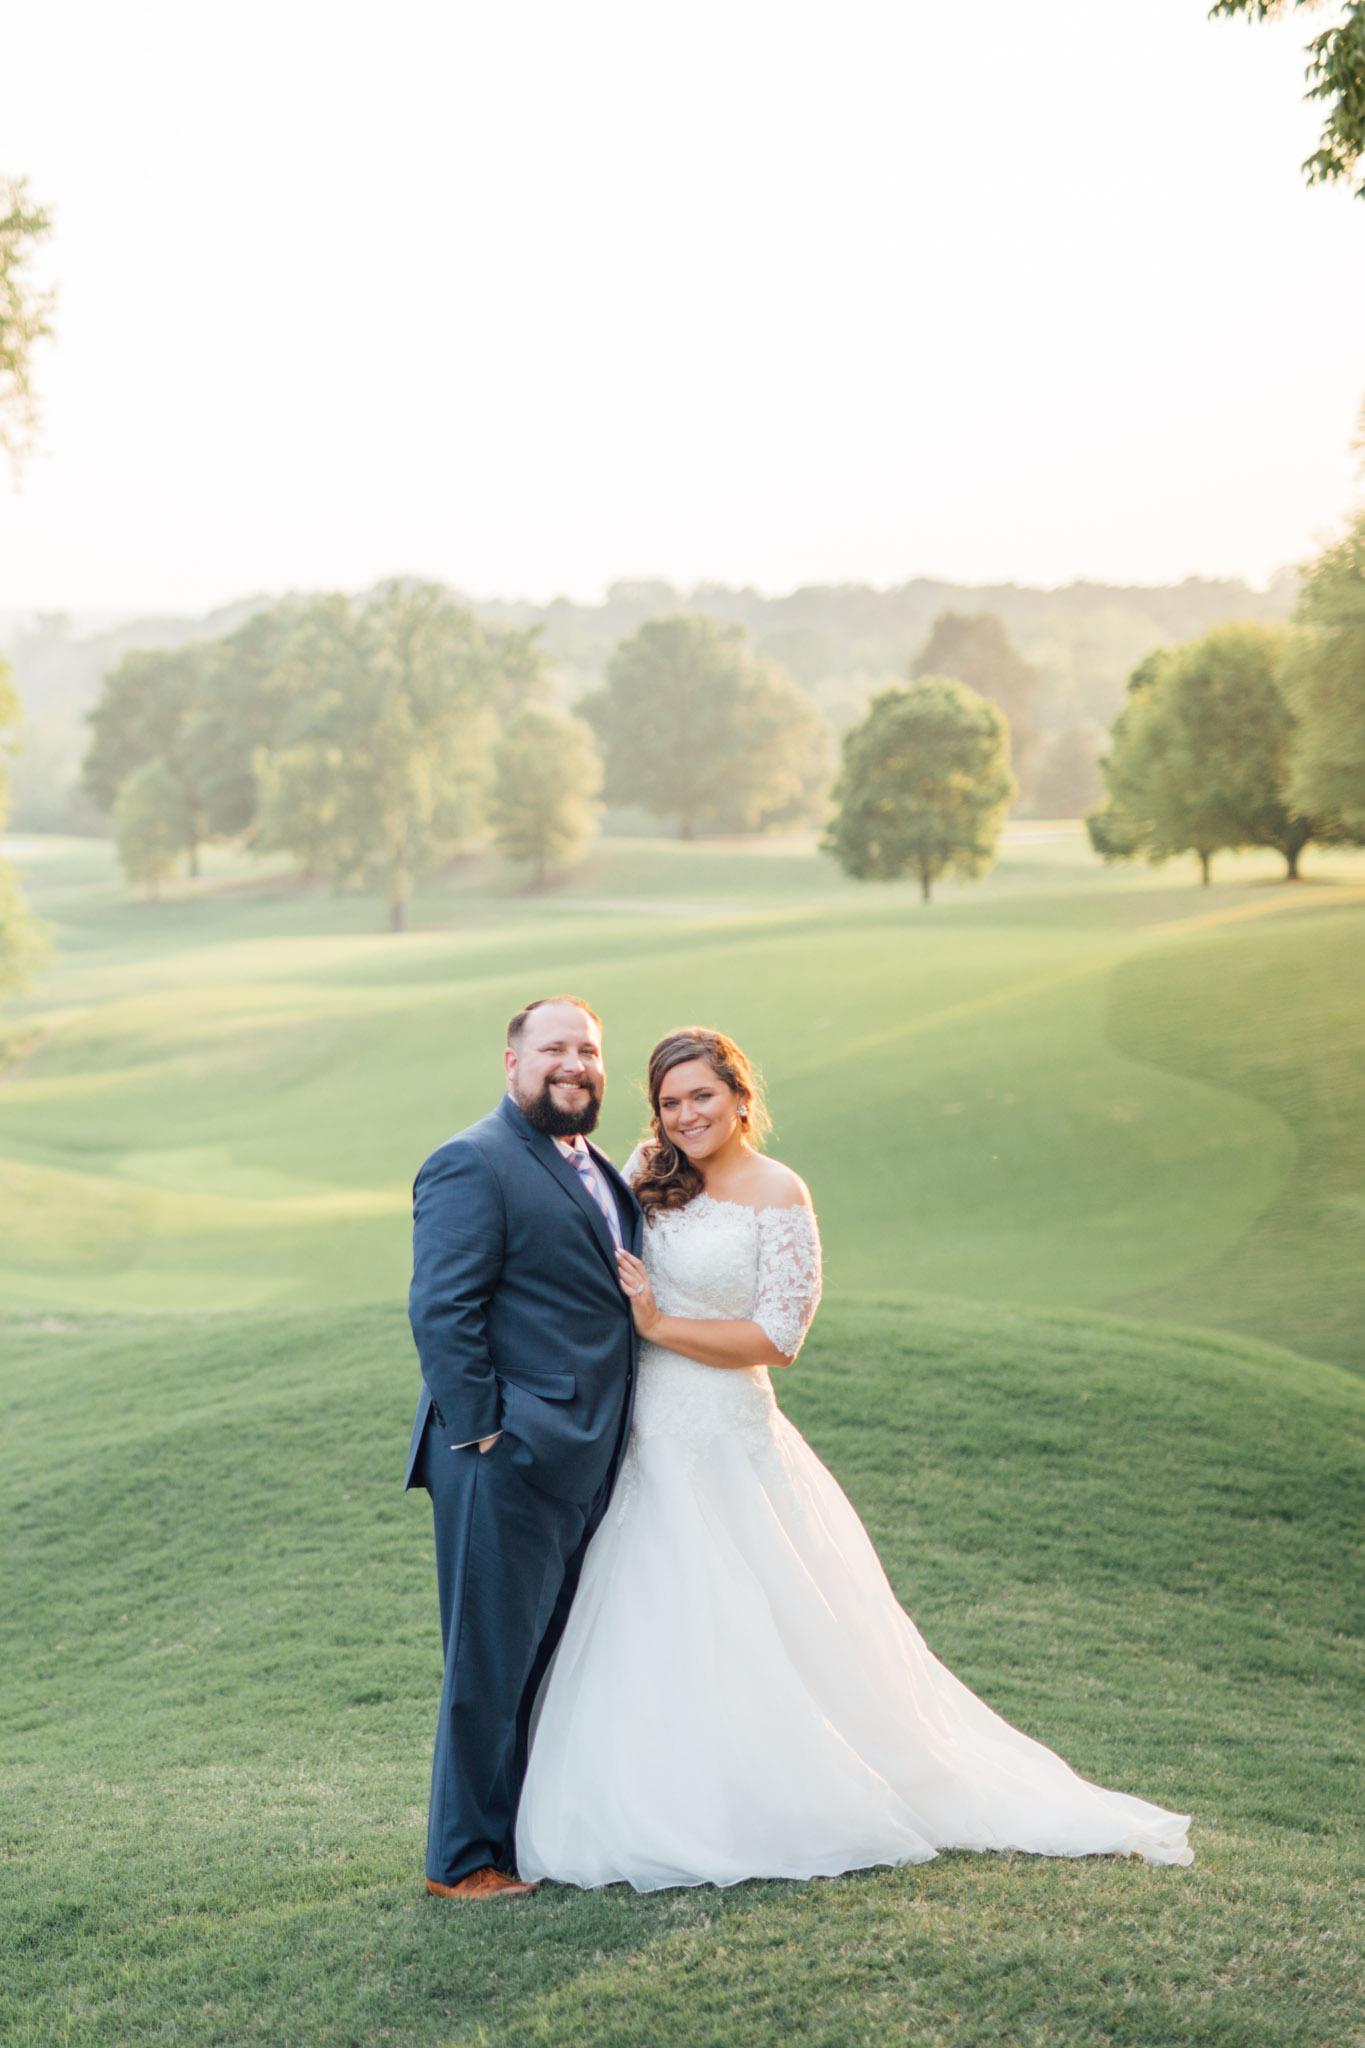 Country Club of Virginia Wedding Photographer_0095.jpg